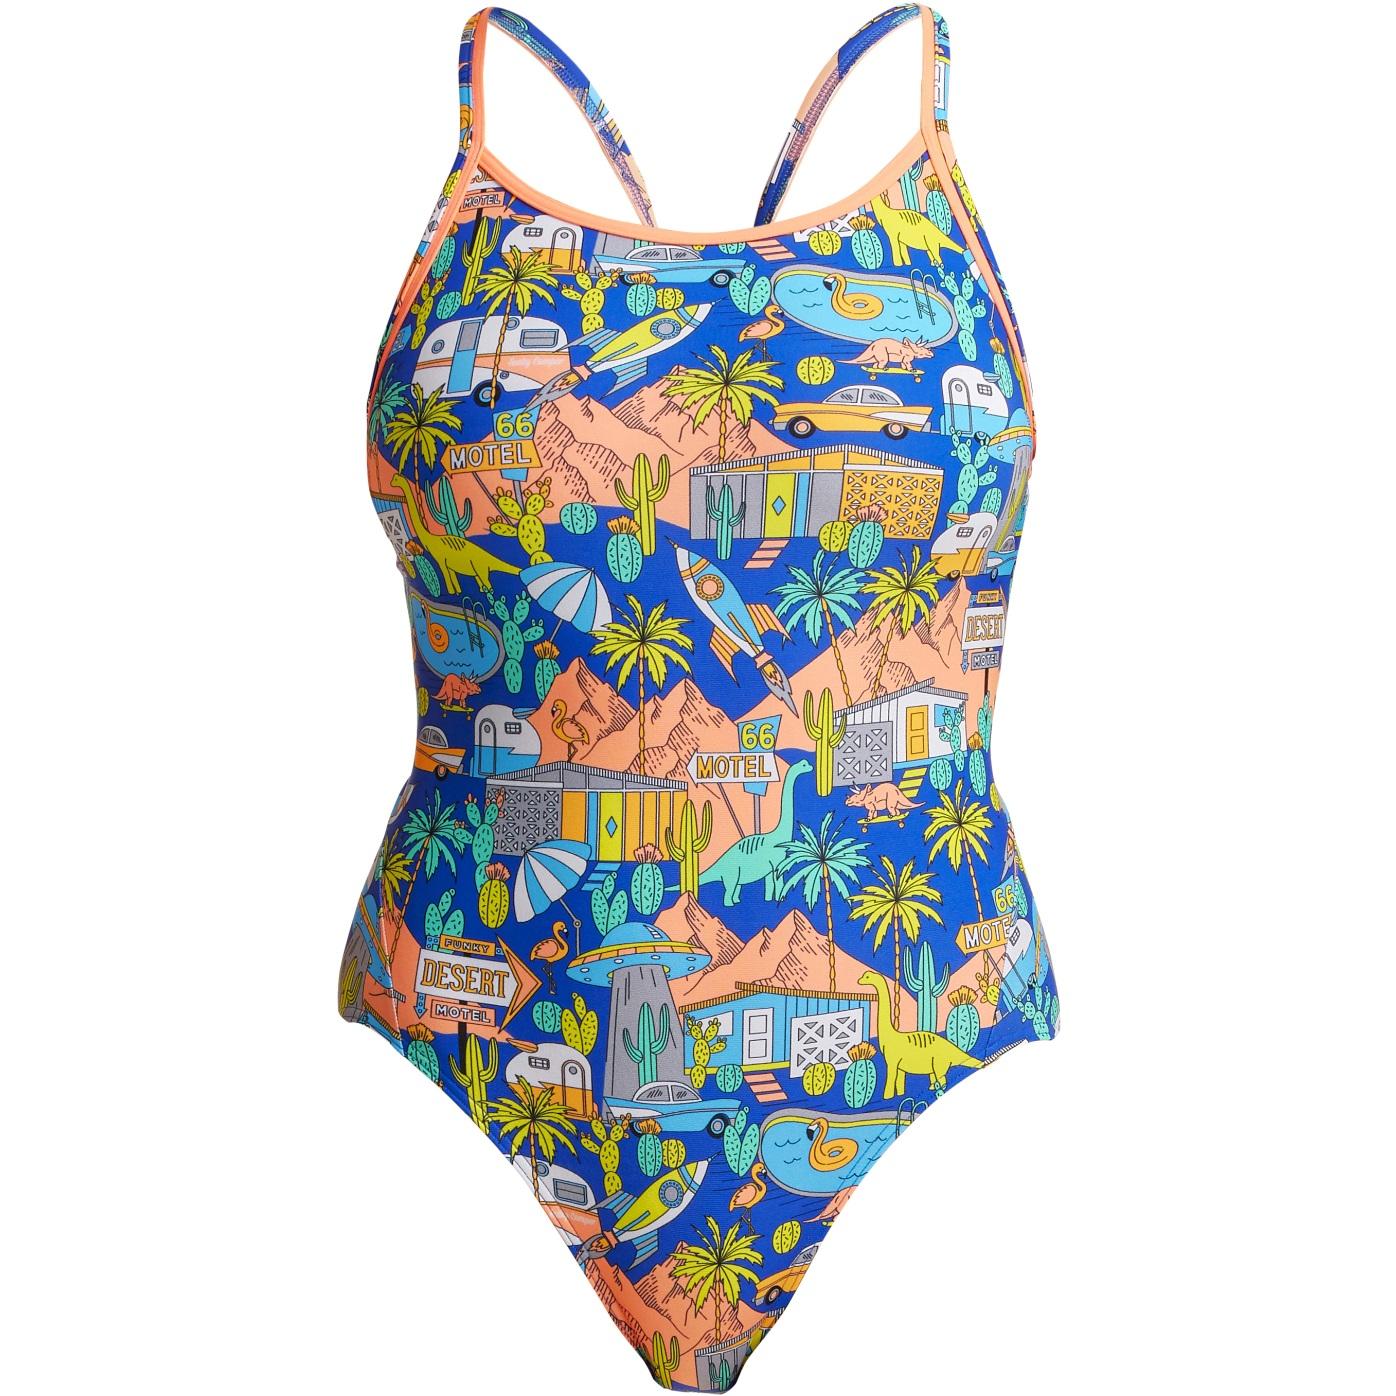 Funkita Ladies Diamond Back One Piece Swimsuit - Wacky West